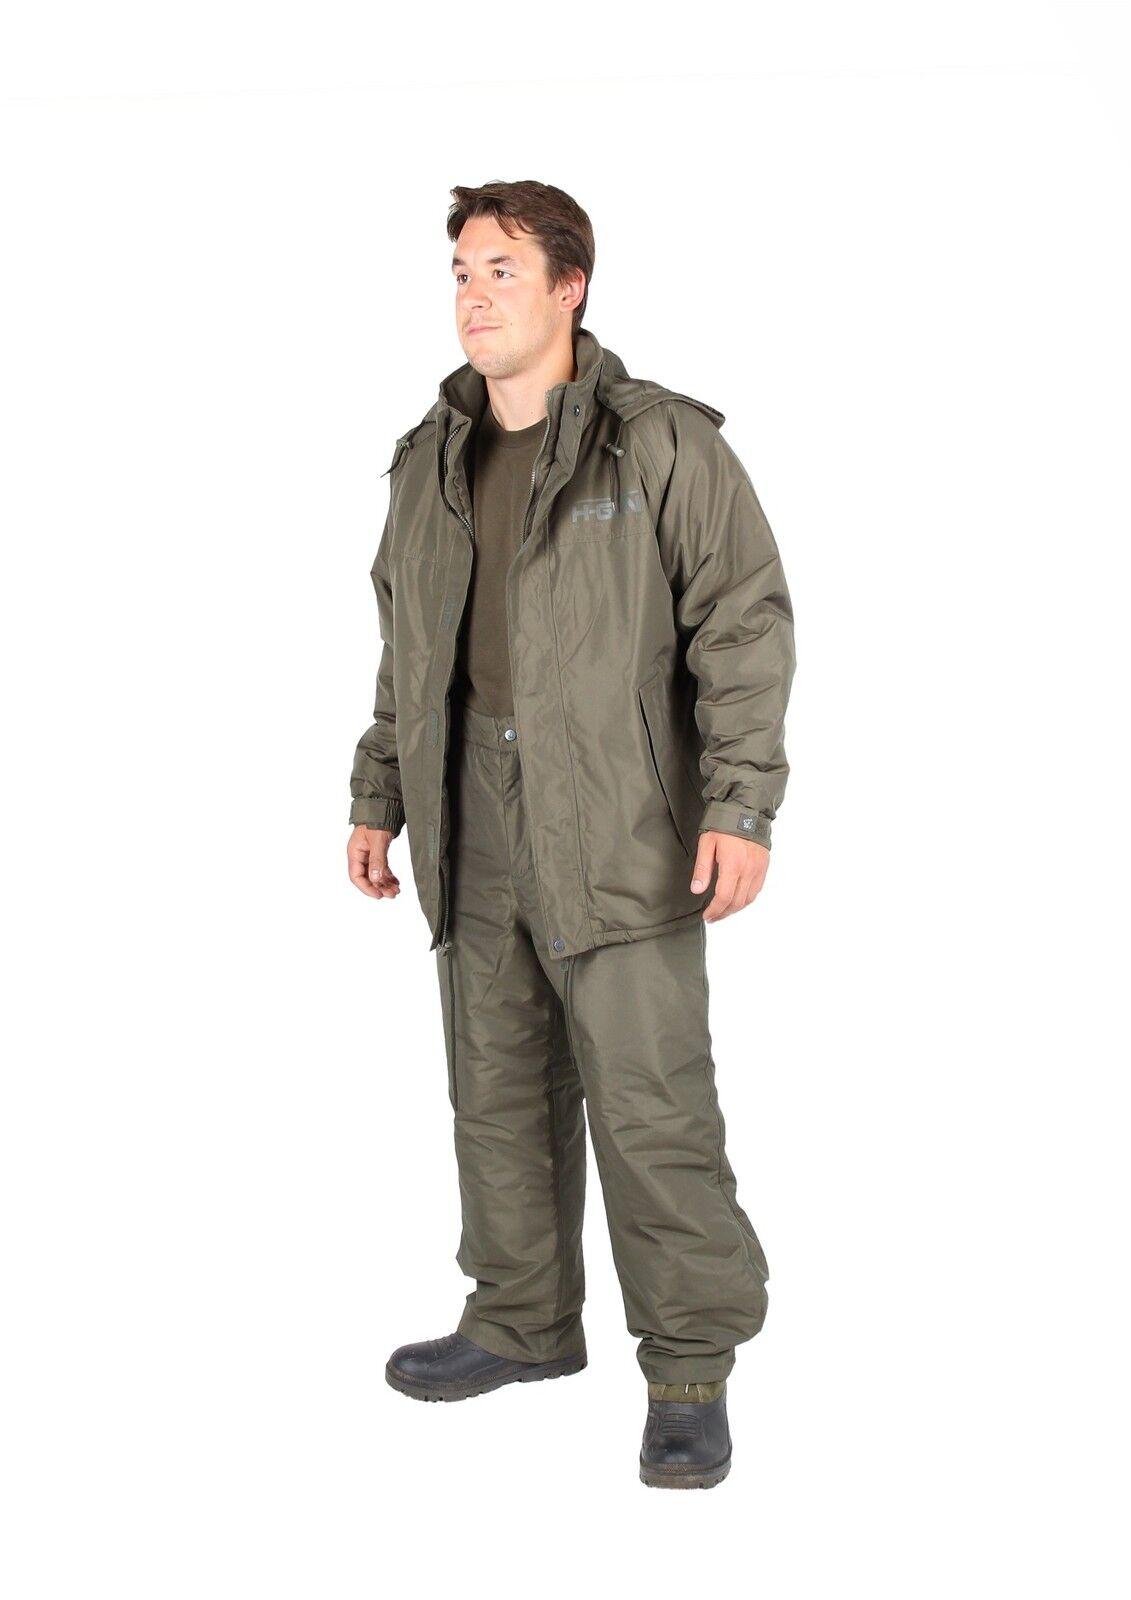 Nash H-Gun Jacket Trousers + T-Shirt Combo Anzug Angelanzug Jacke + Hose + Shirt